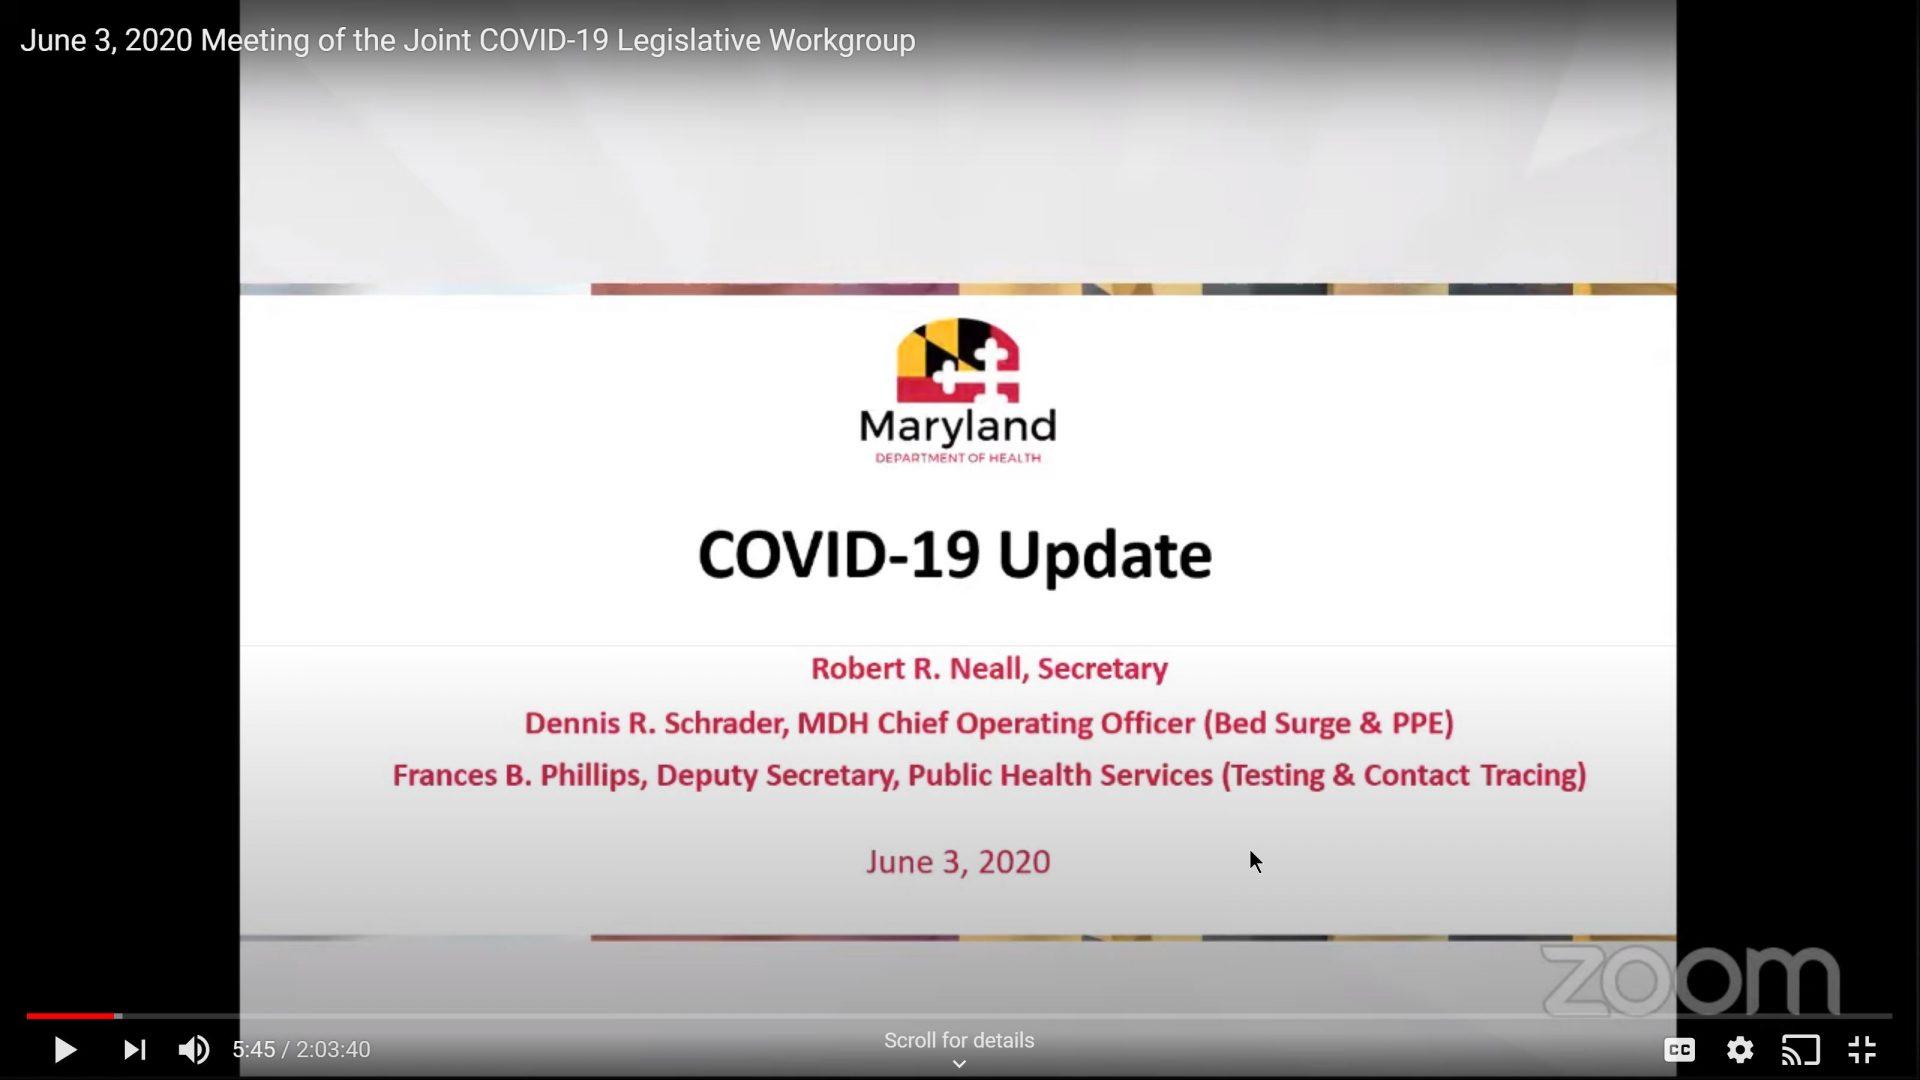 State Health Officials Brief COVID-19 Legislative Workgroup